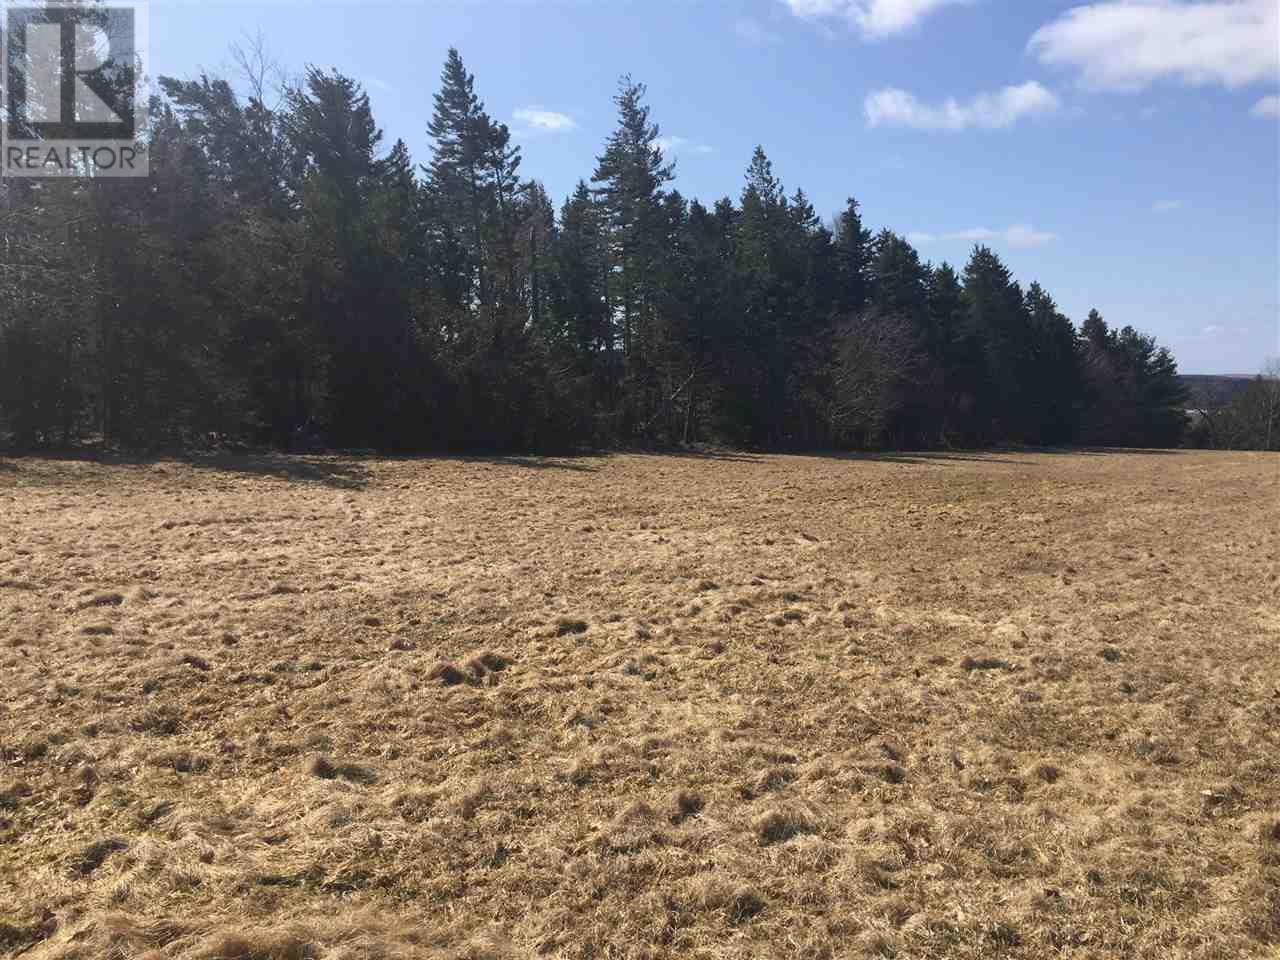 Lot 7 Pine Meadows Subdivision